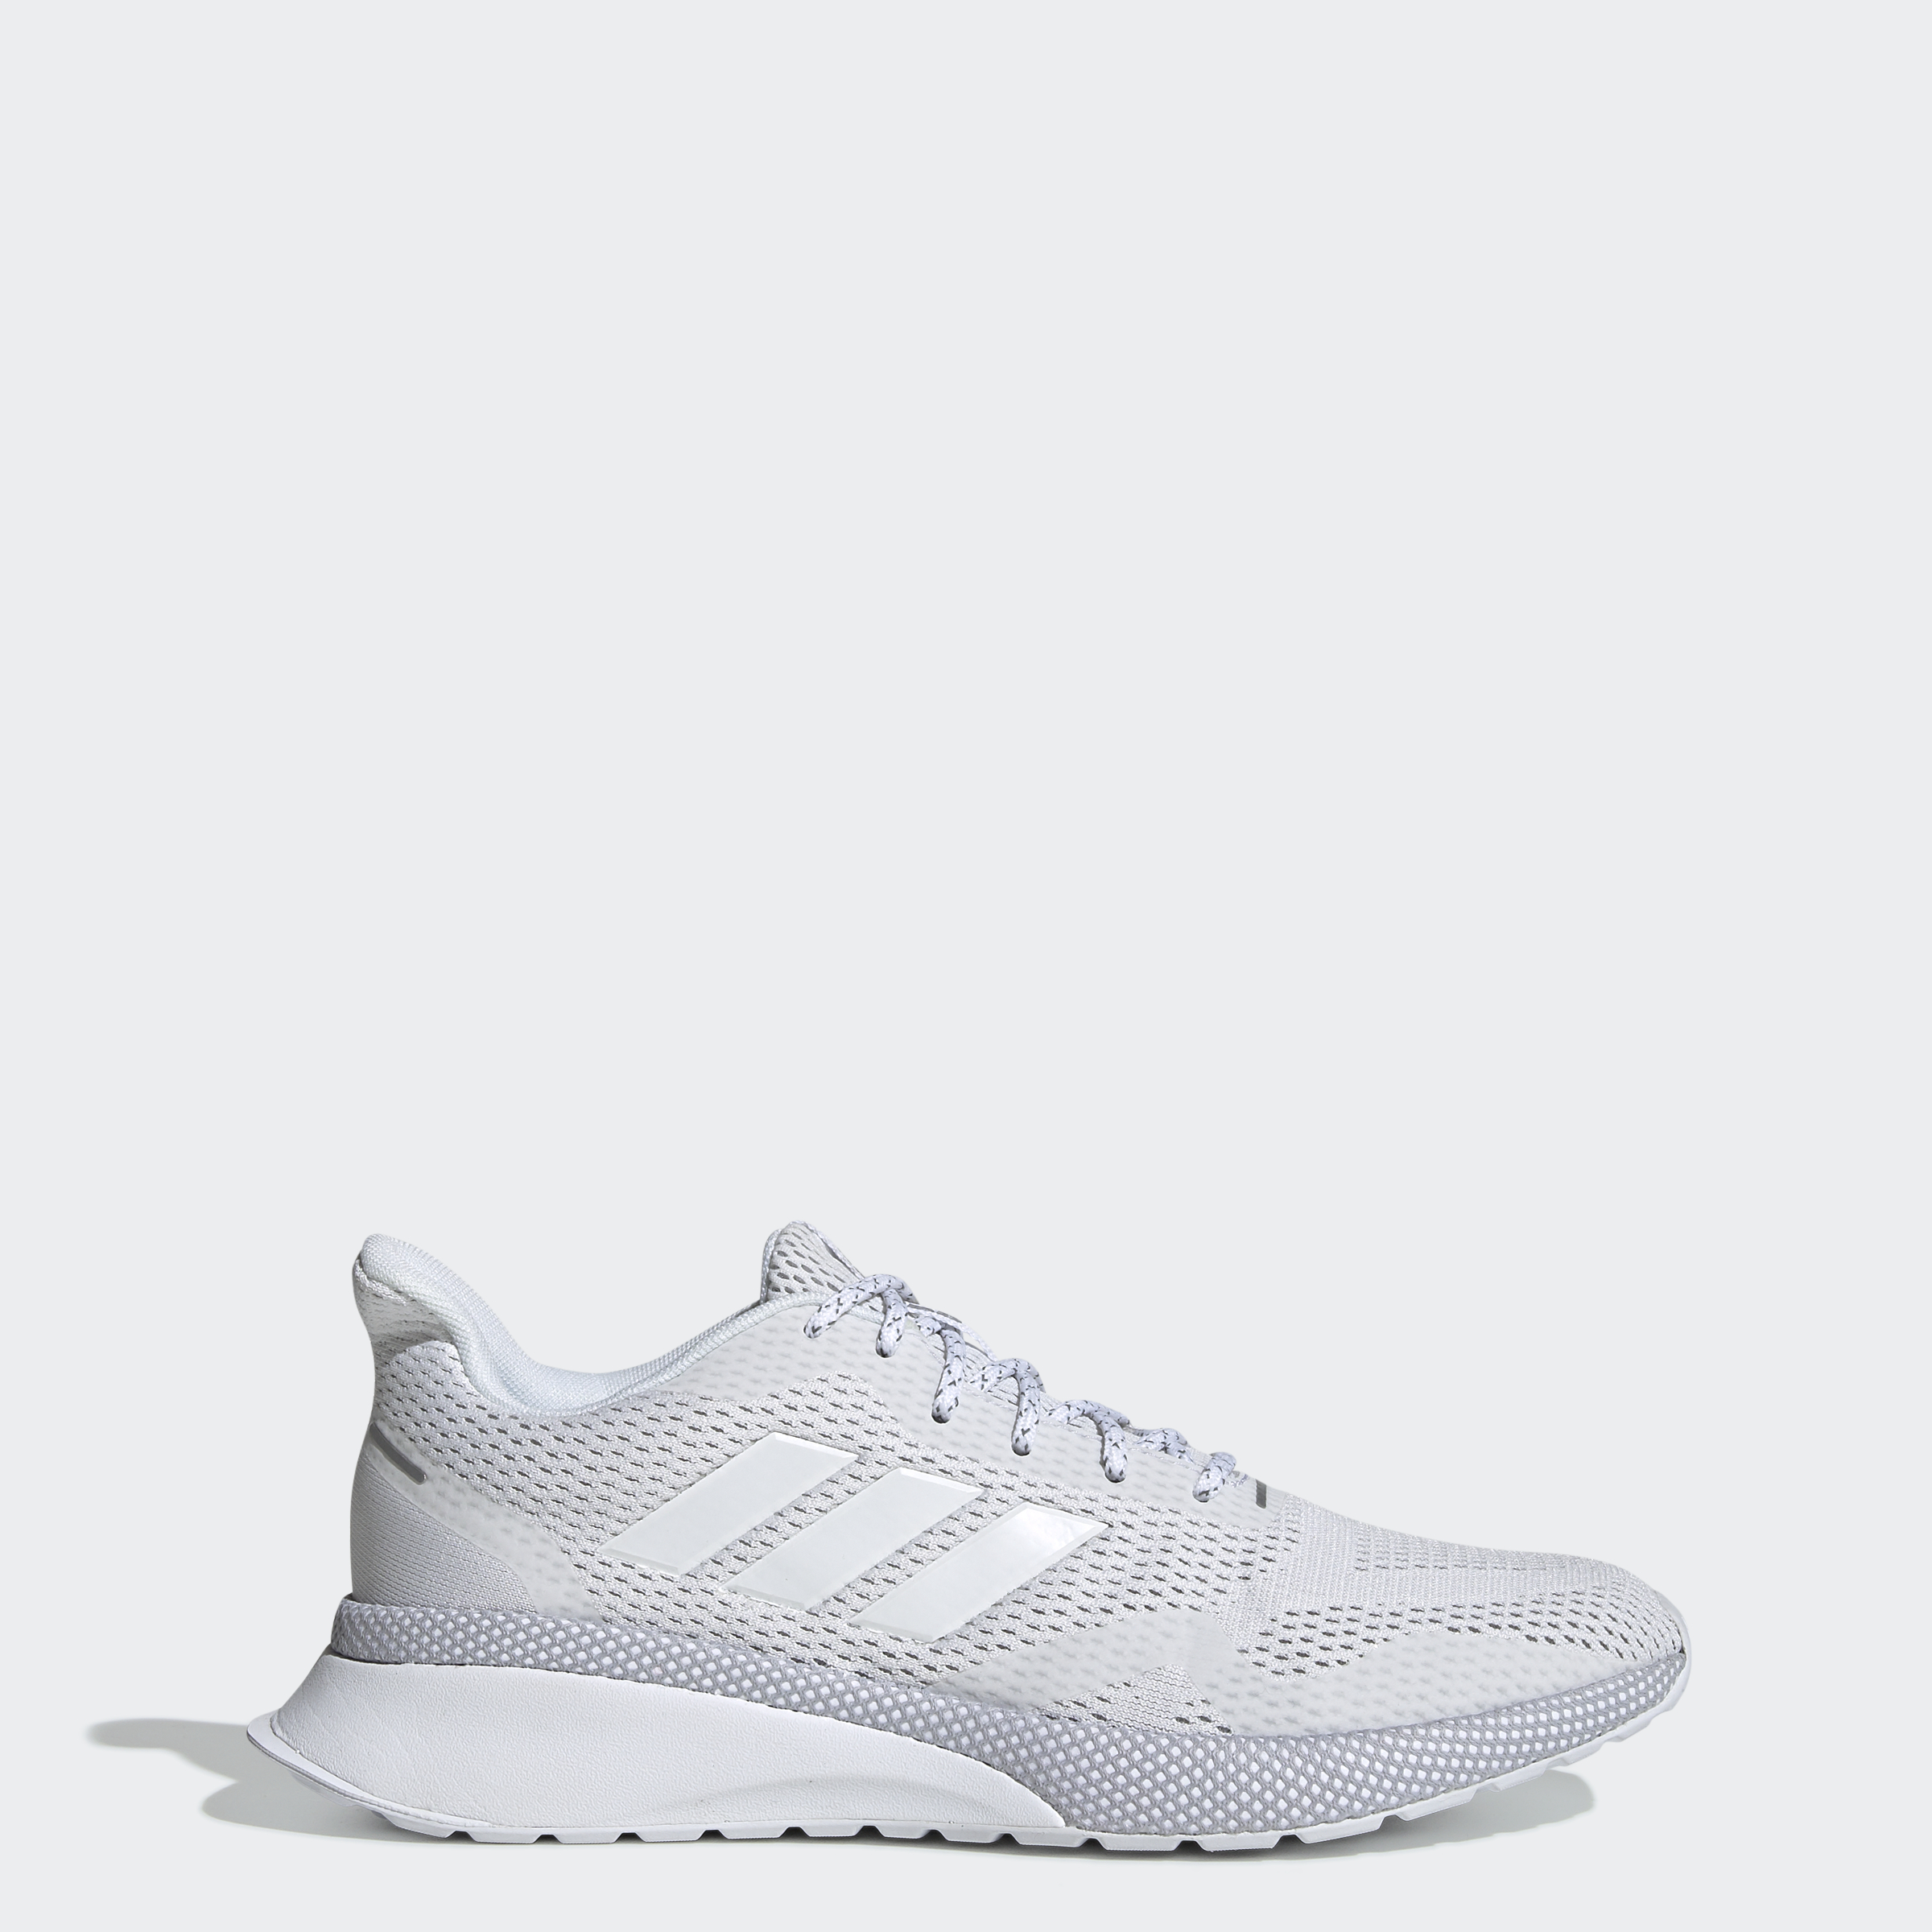 adidas-NOVAFVSE-X-Shoes-Women-039-s thumbnail 19